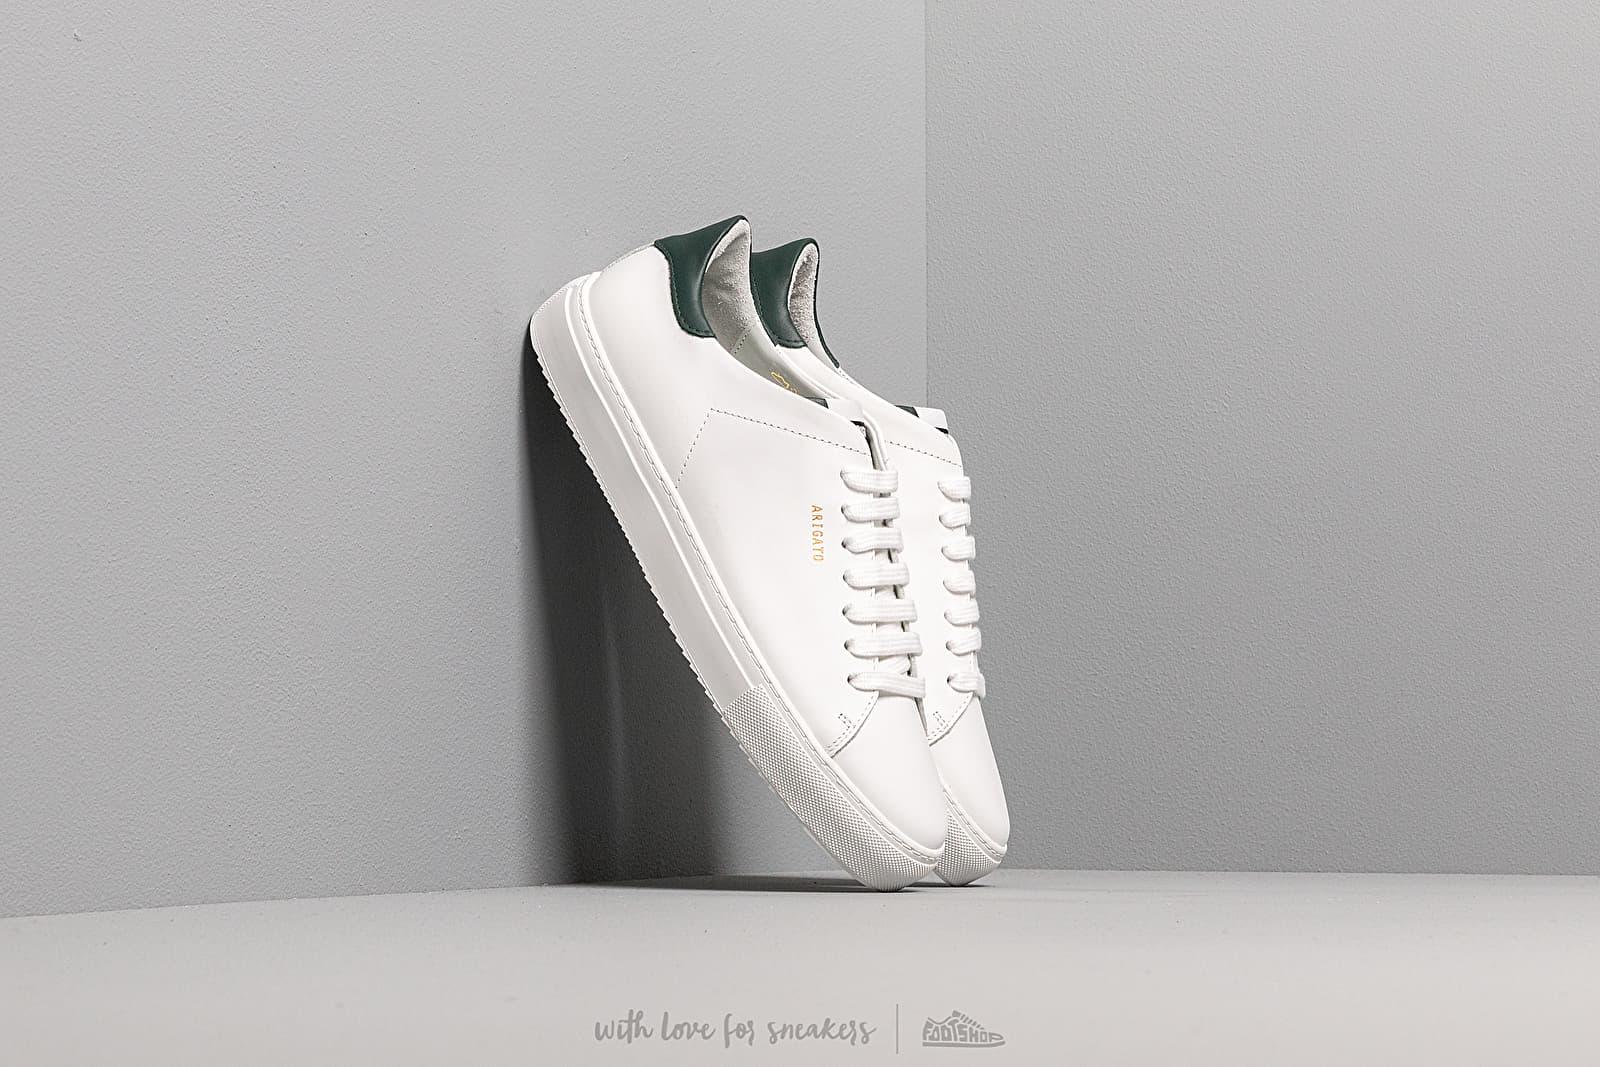 Pánské tenisky a boty AXEL ARIGATO Clean 90 Leather White/ Green